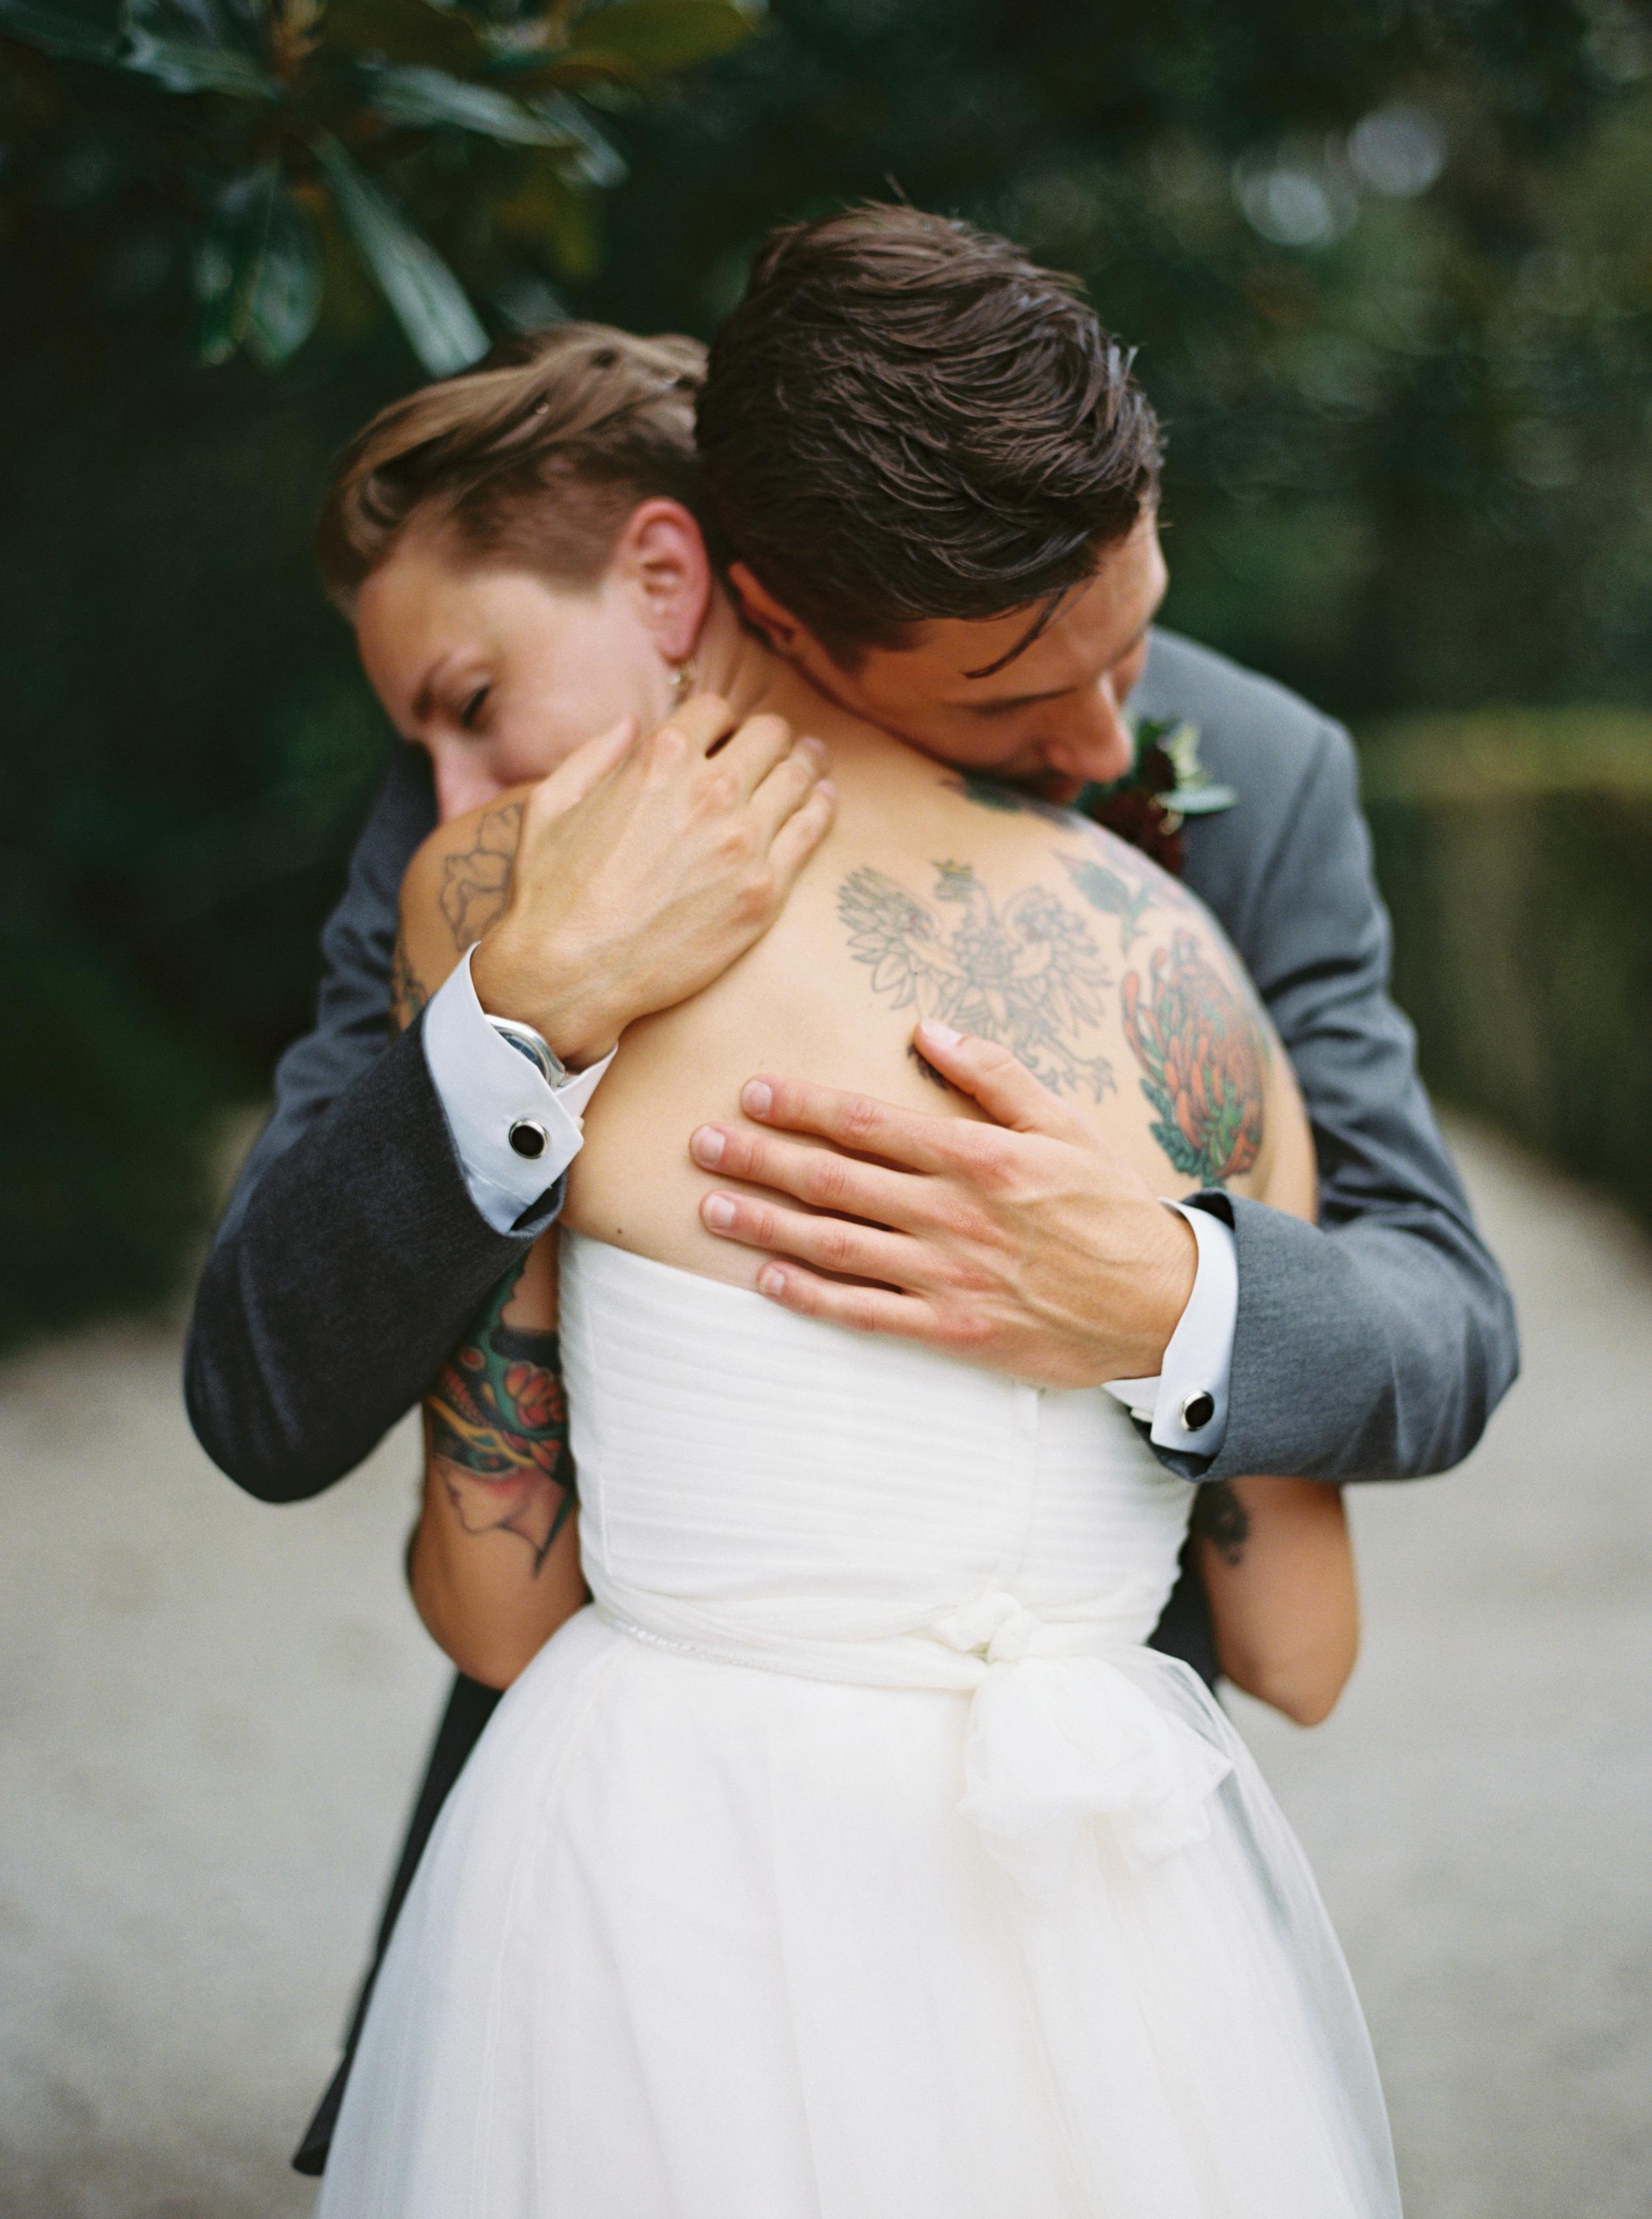 Kyle John l Fine Art Wedding Photography l Chicago, Copenhagen, California, New York, Destination l Blog l Emily & Evan_Wedding_14